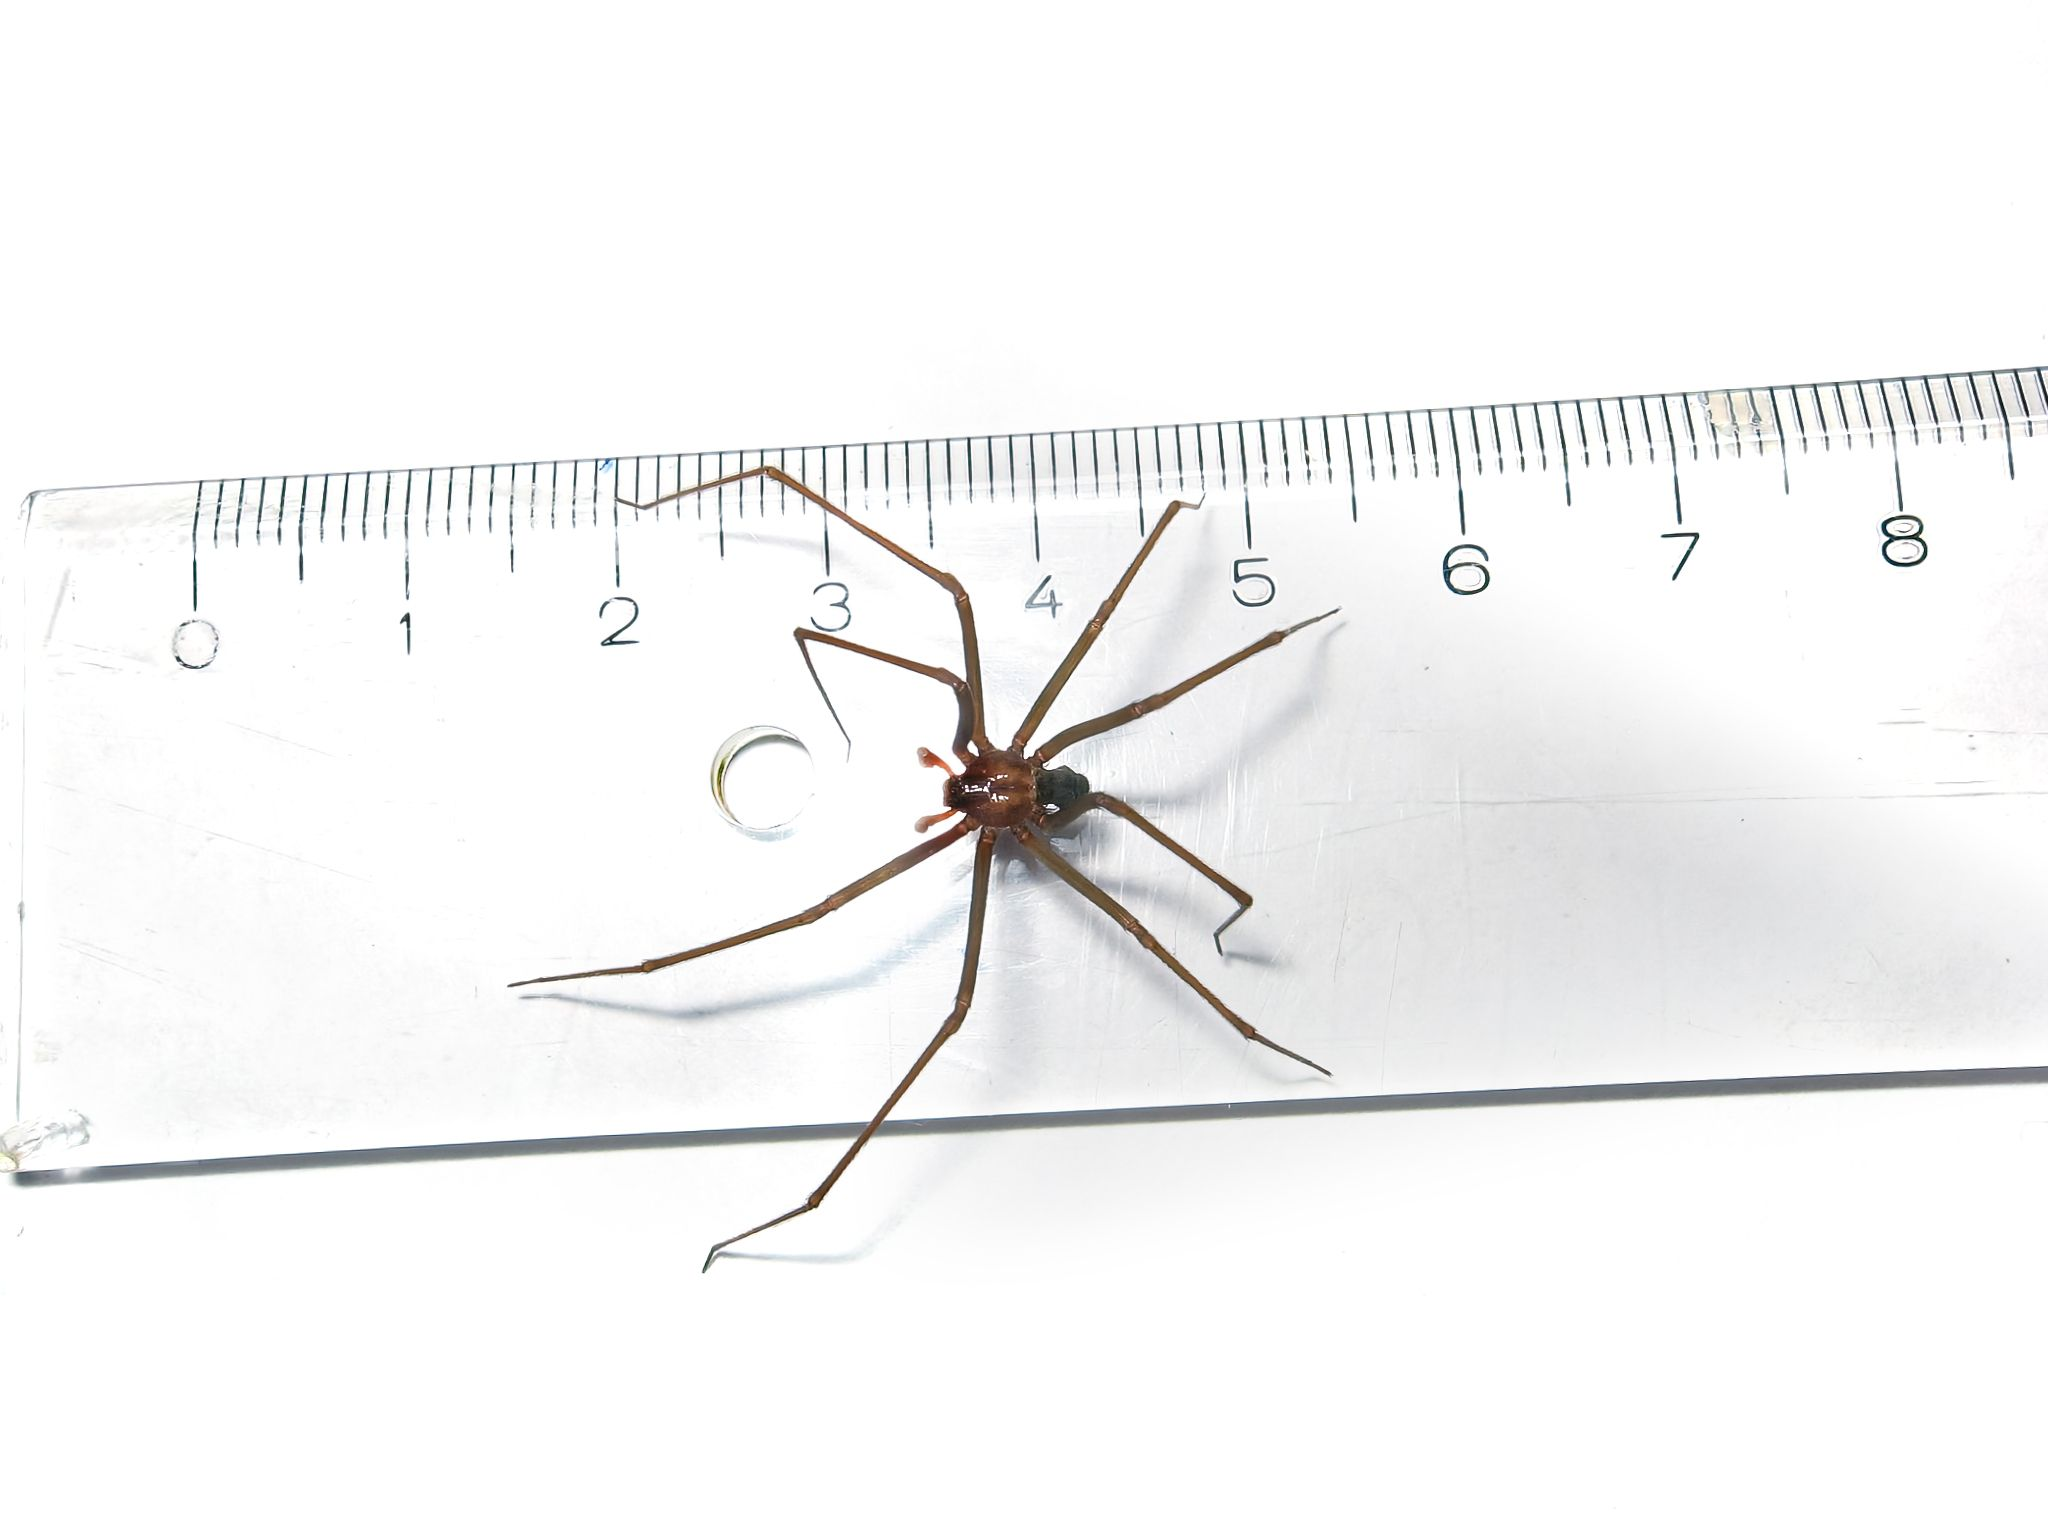 Brown recluse (Loxosceles) spider legspan size